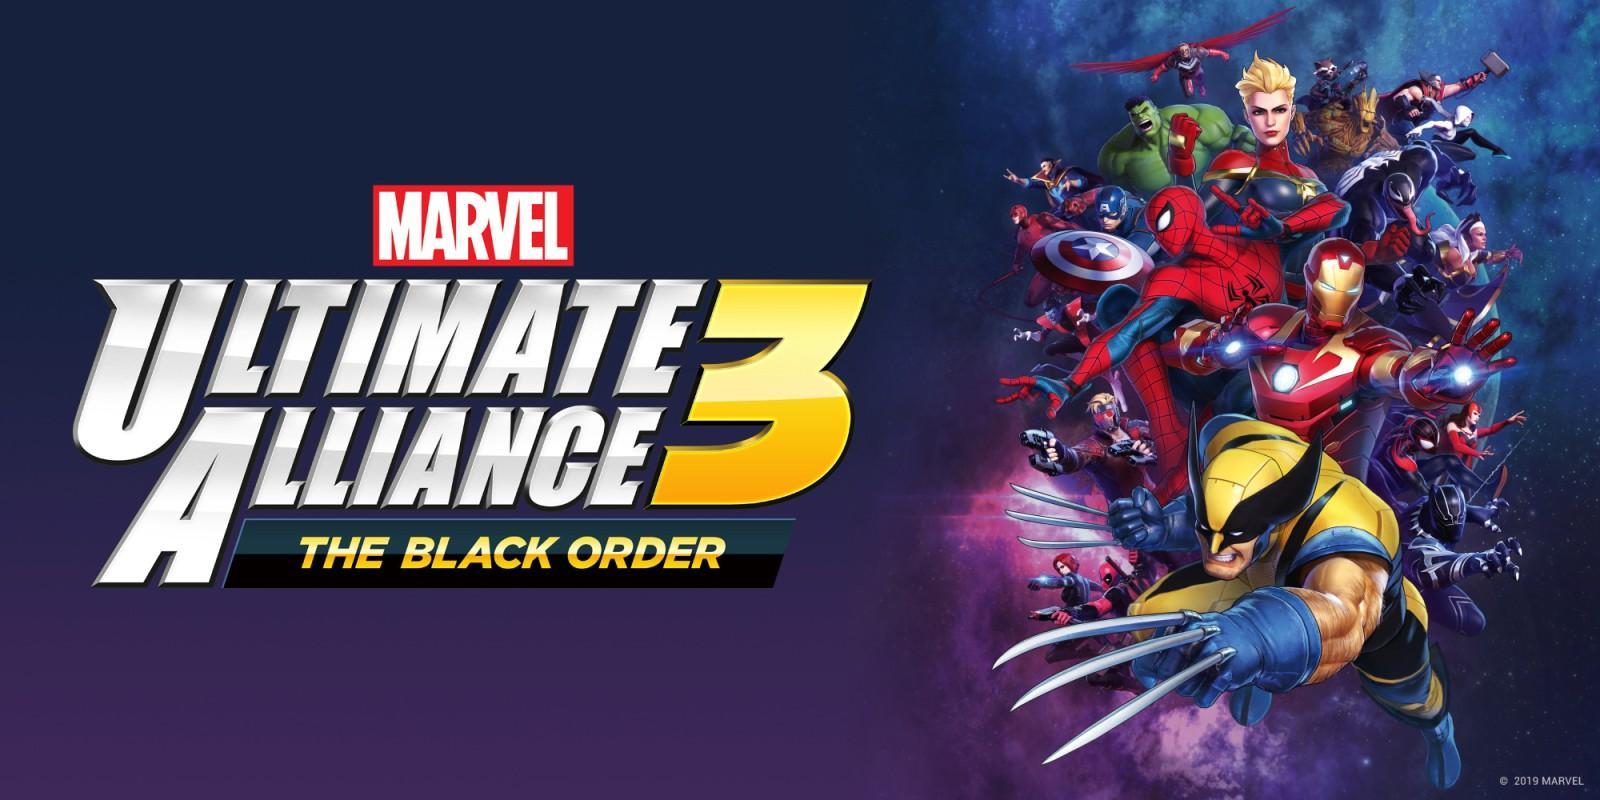 Marvel Ultimate Alliance 3 The Black Order Wallpapers Wallpaper